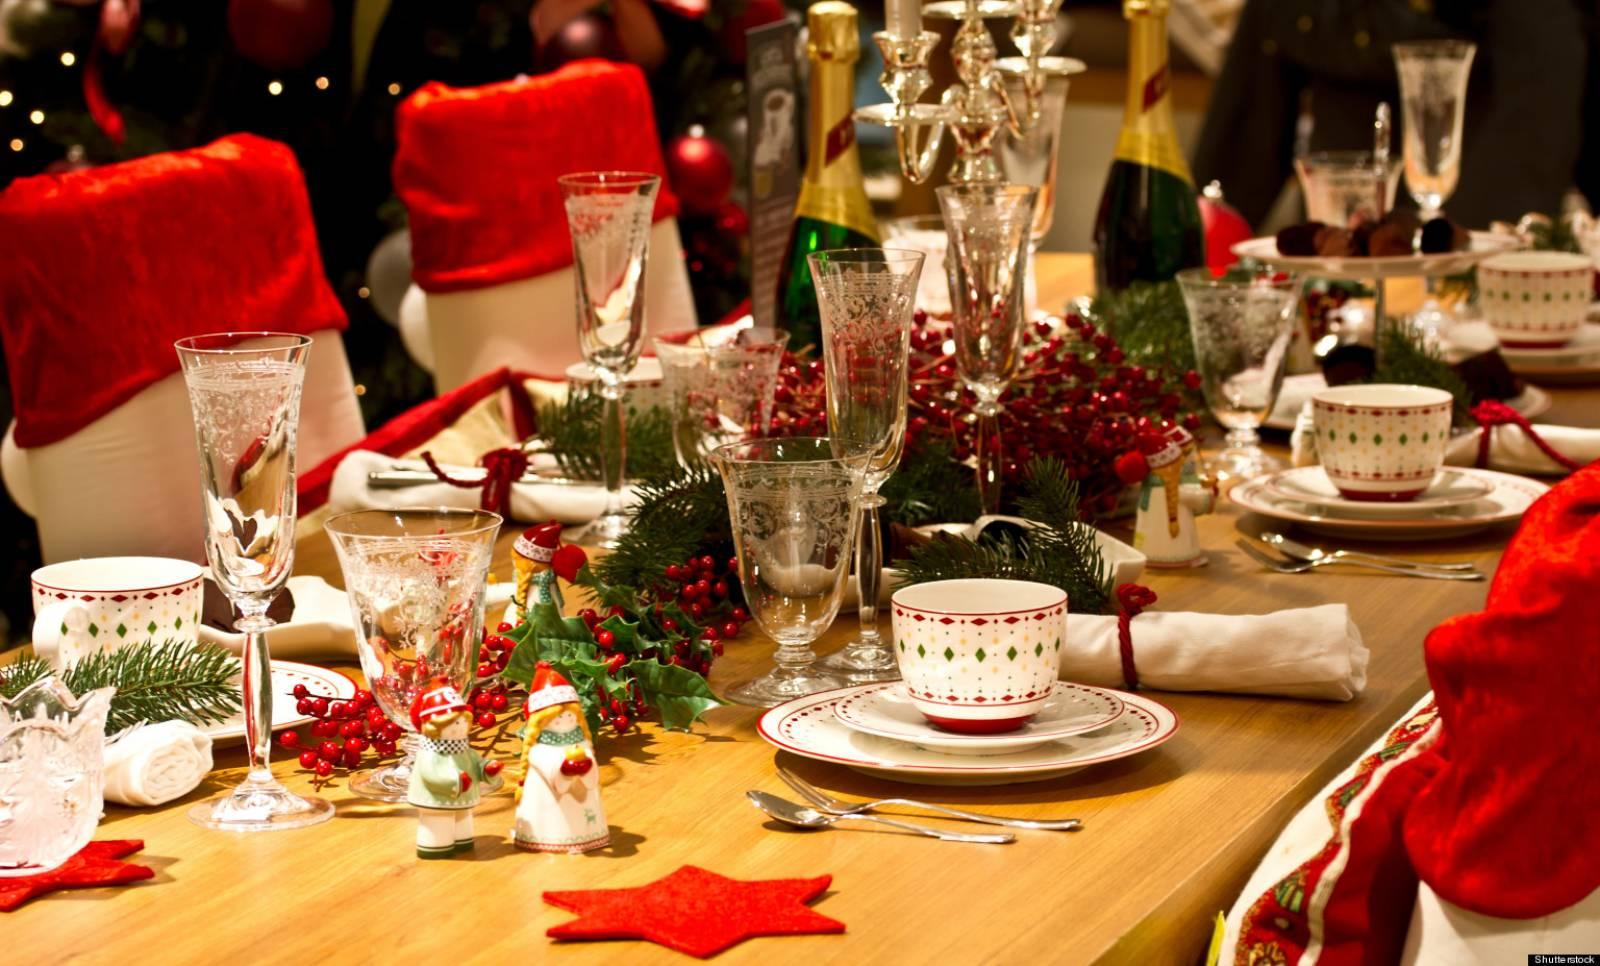 Menu de Noël : il faut proposer des plats originaux !